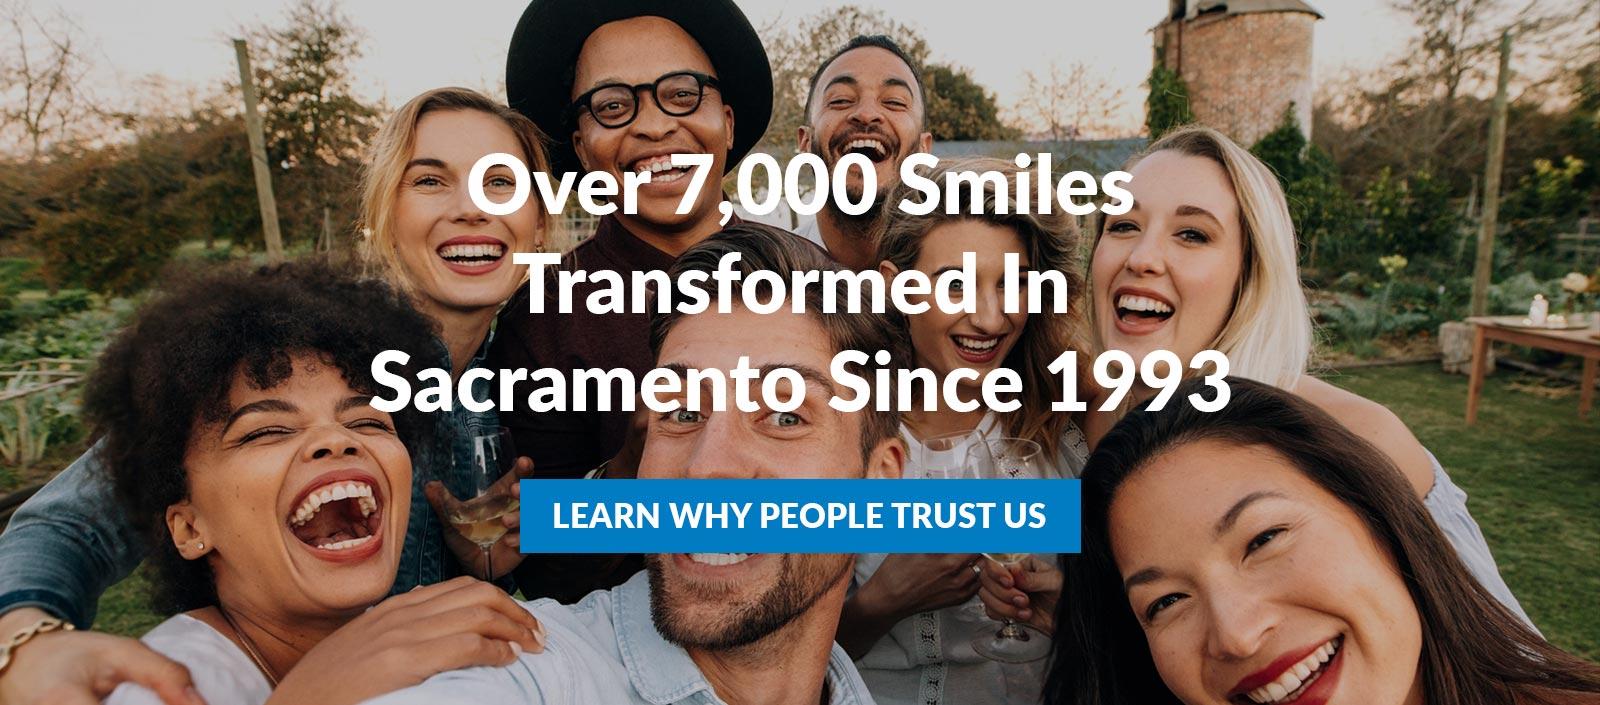 Orthodontist in Rocklin CA | Elenberger Orthodontics